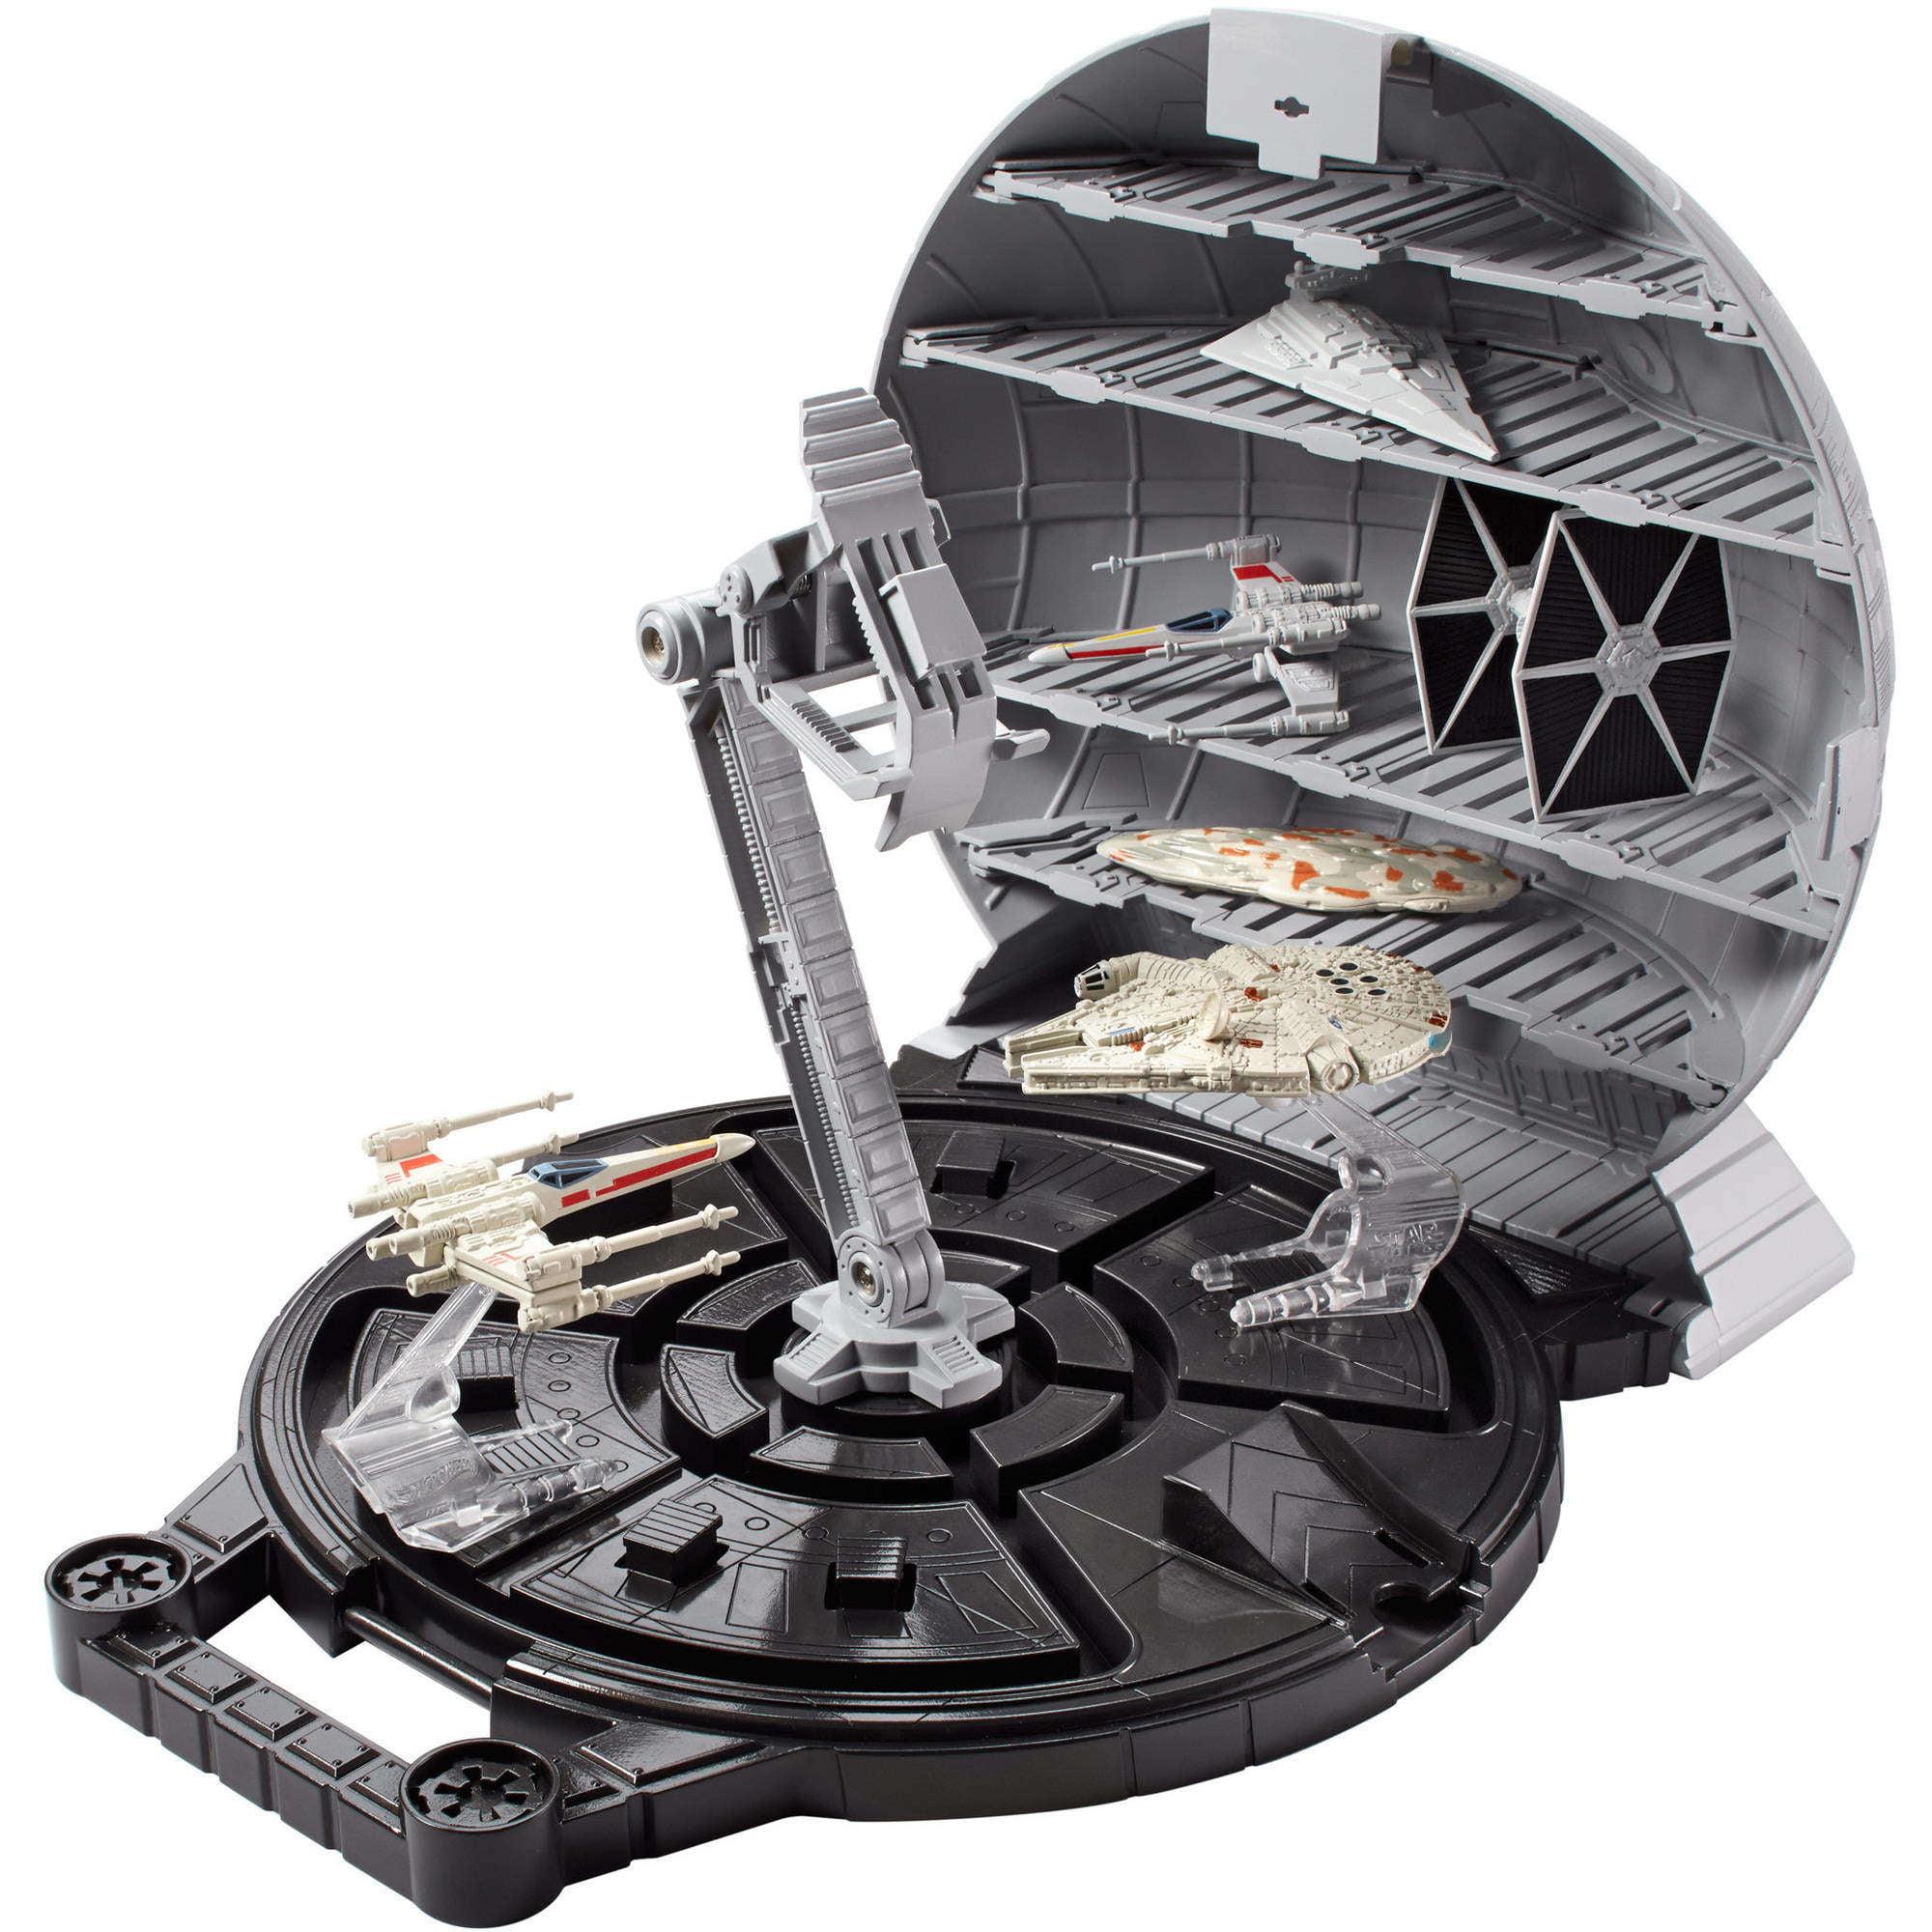 Hot Wheels Star Wars Death Star Play Case